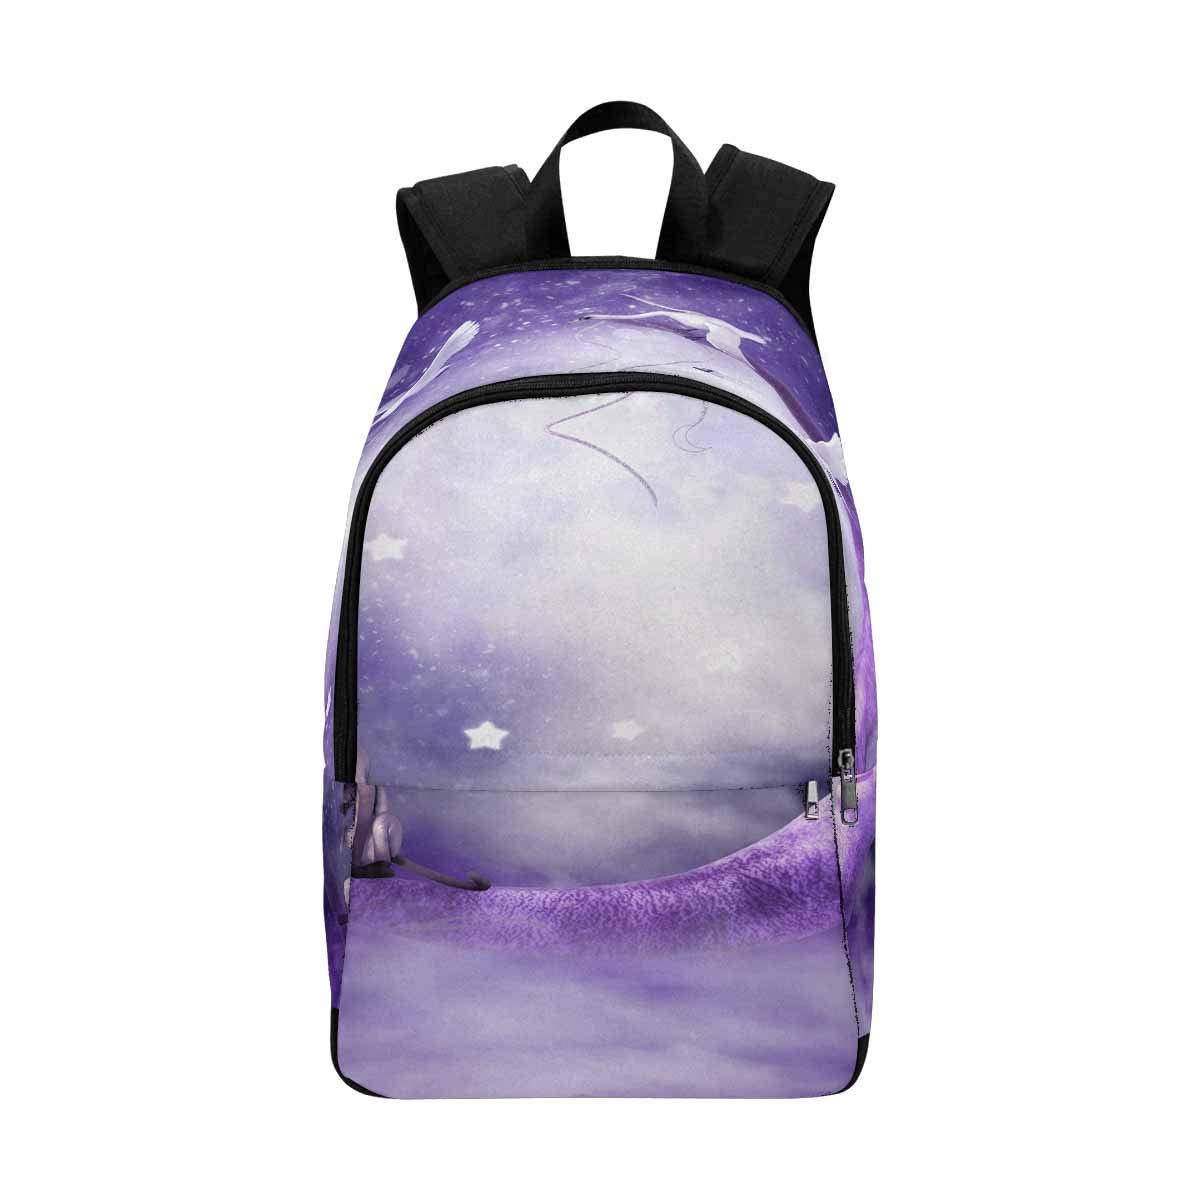 InterestPrint Purple Moon Custom Casual Travel Laptop Backpack Bookbag Daypack